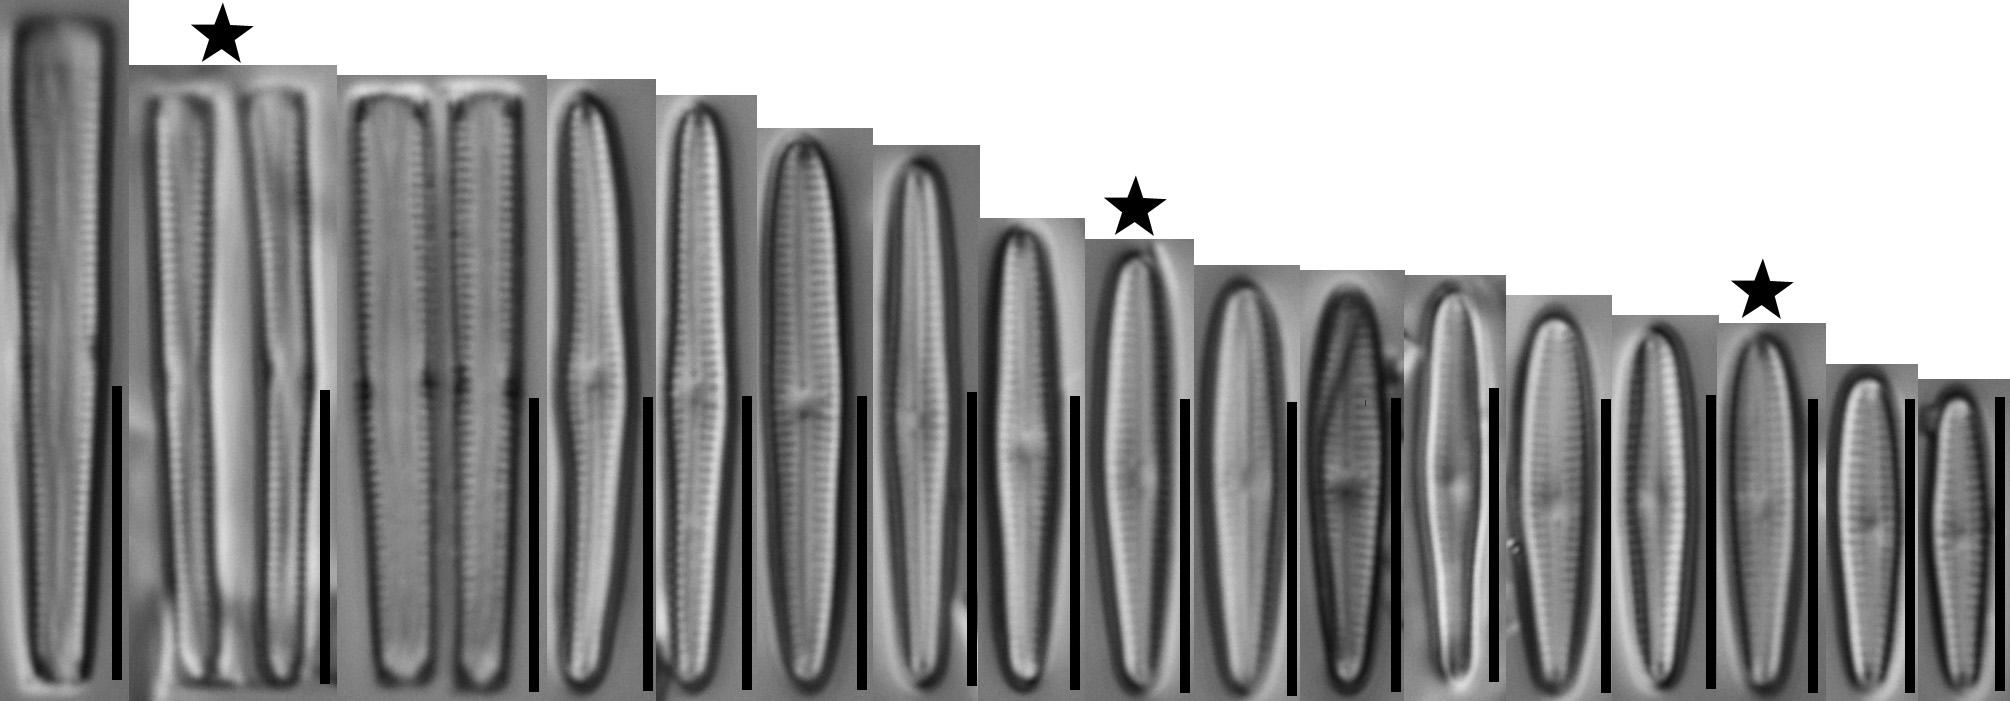 Gomphonema Tackei Var Brevistriata  Holotype  Range Stars In Circle  Gc53756